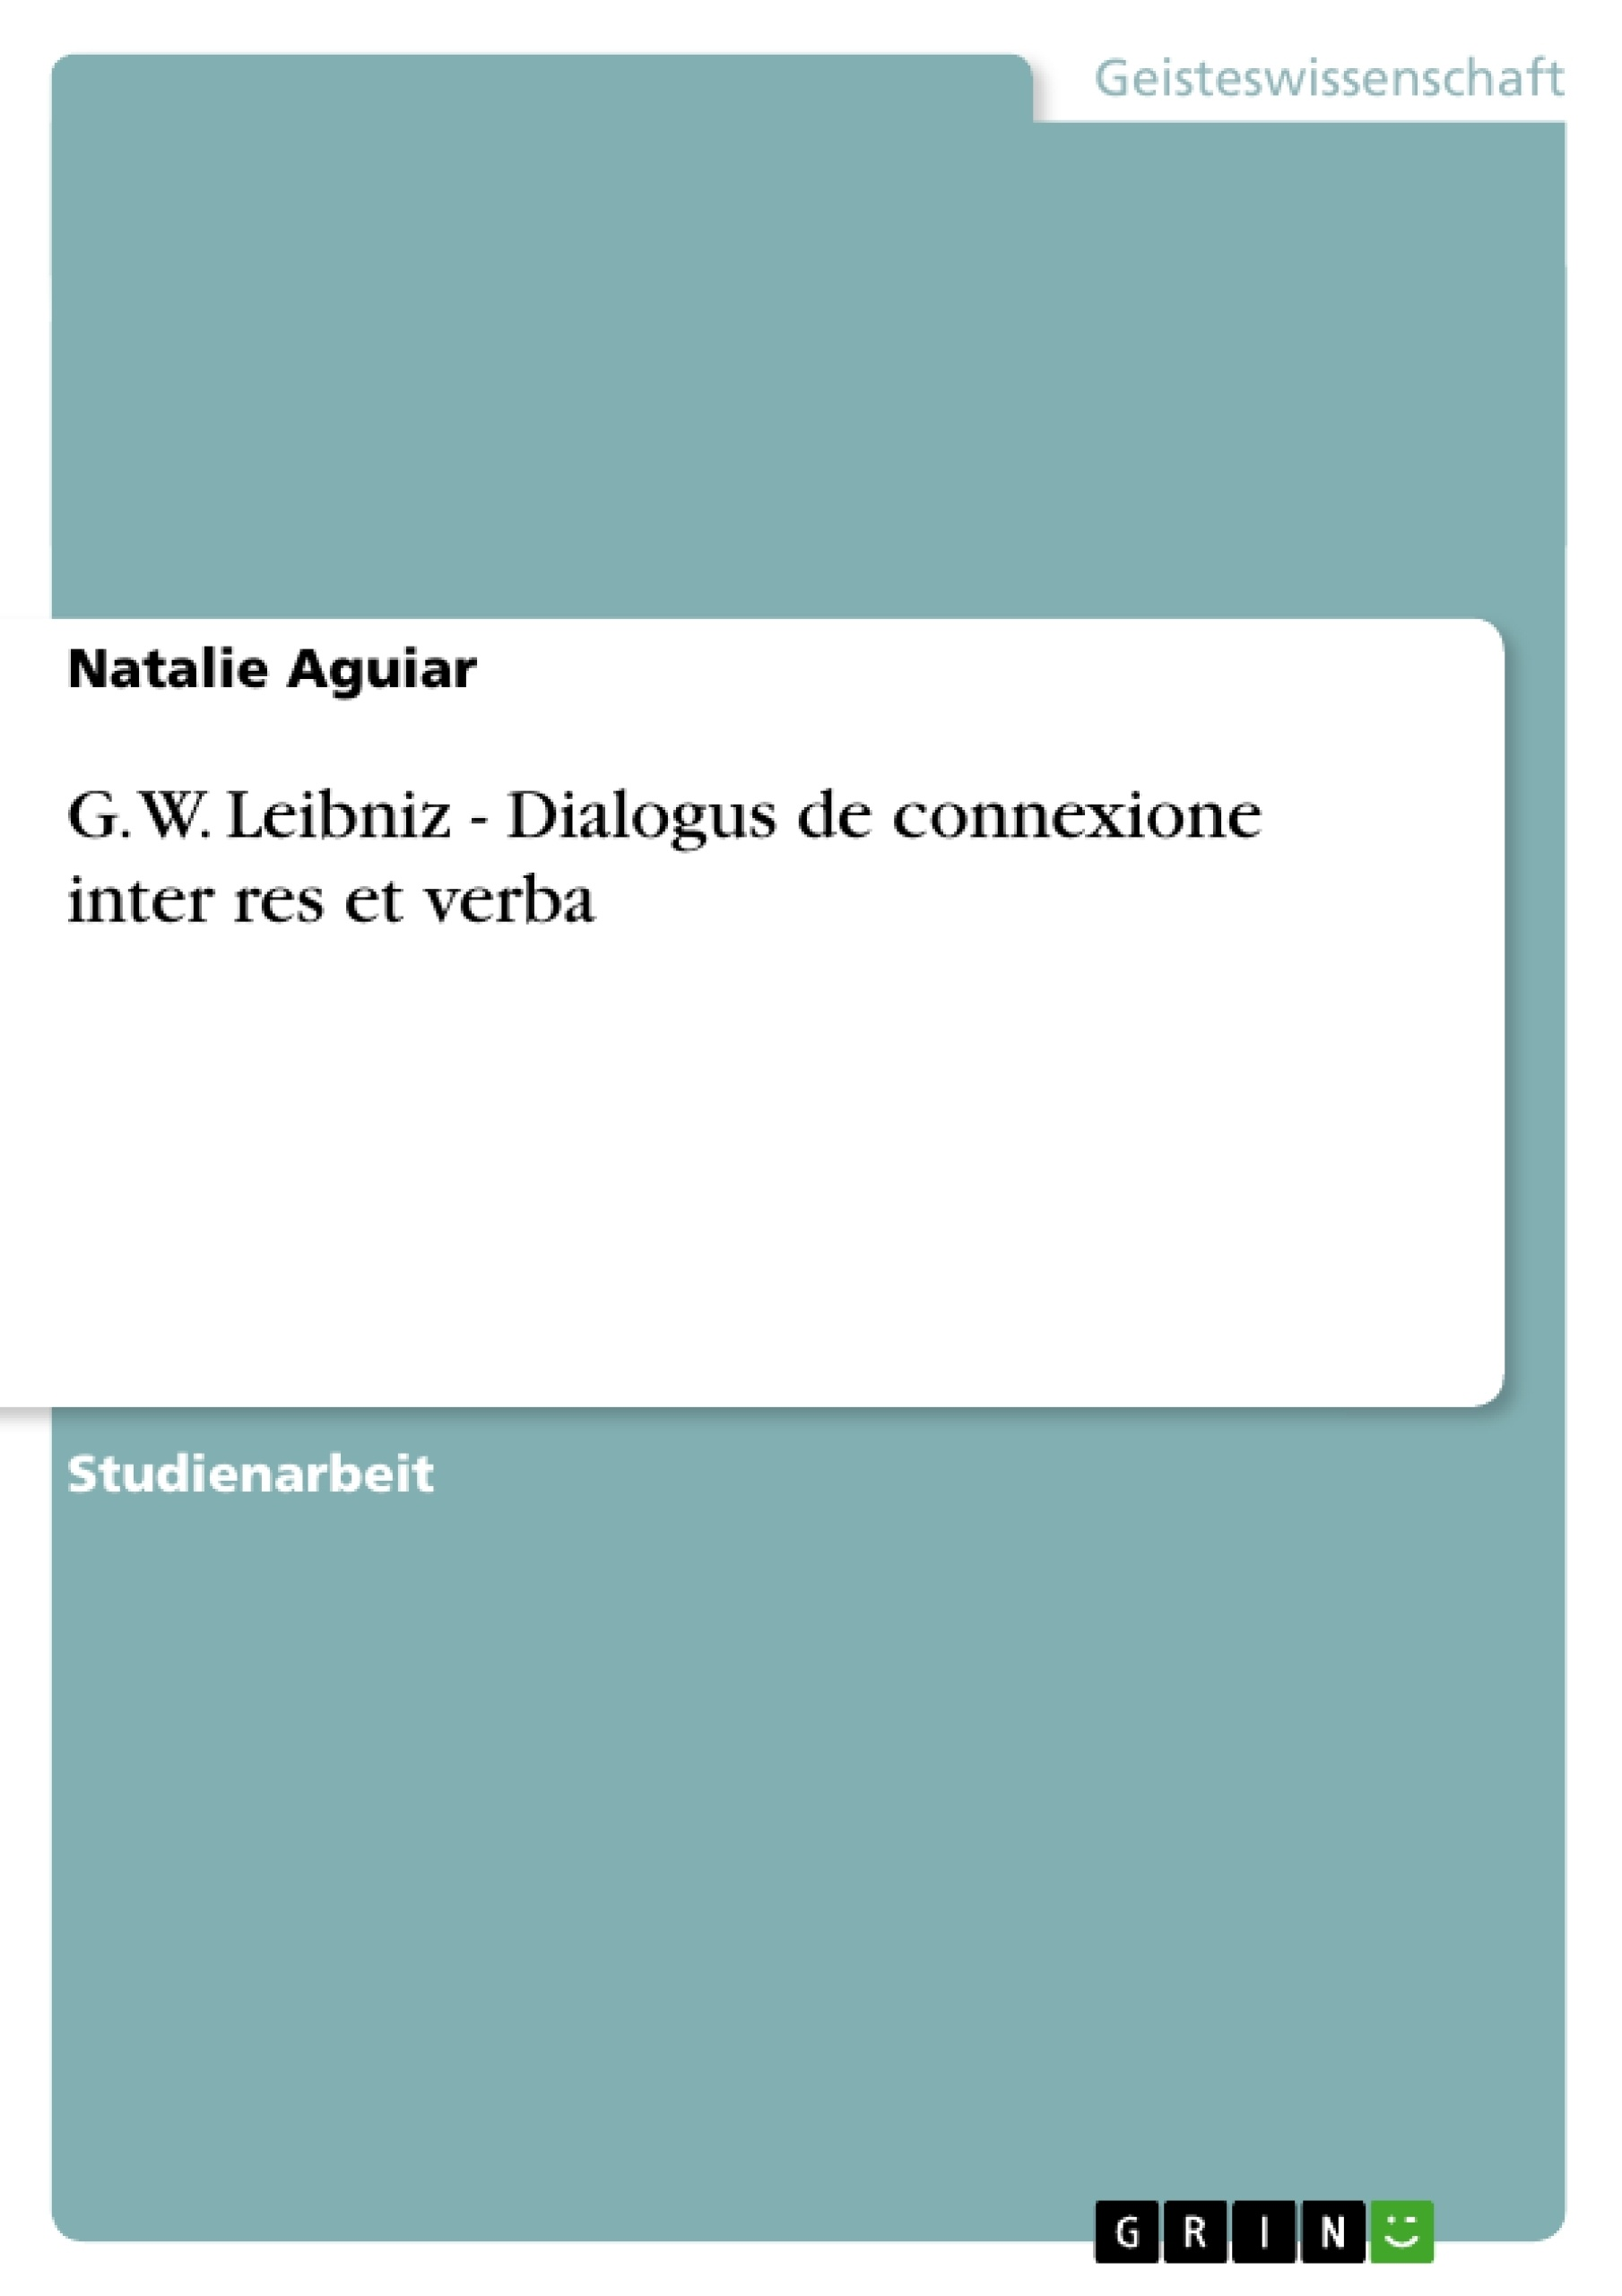 Titel: G. W. Leibniz - Dialogus de connexione inter res et verba